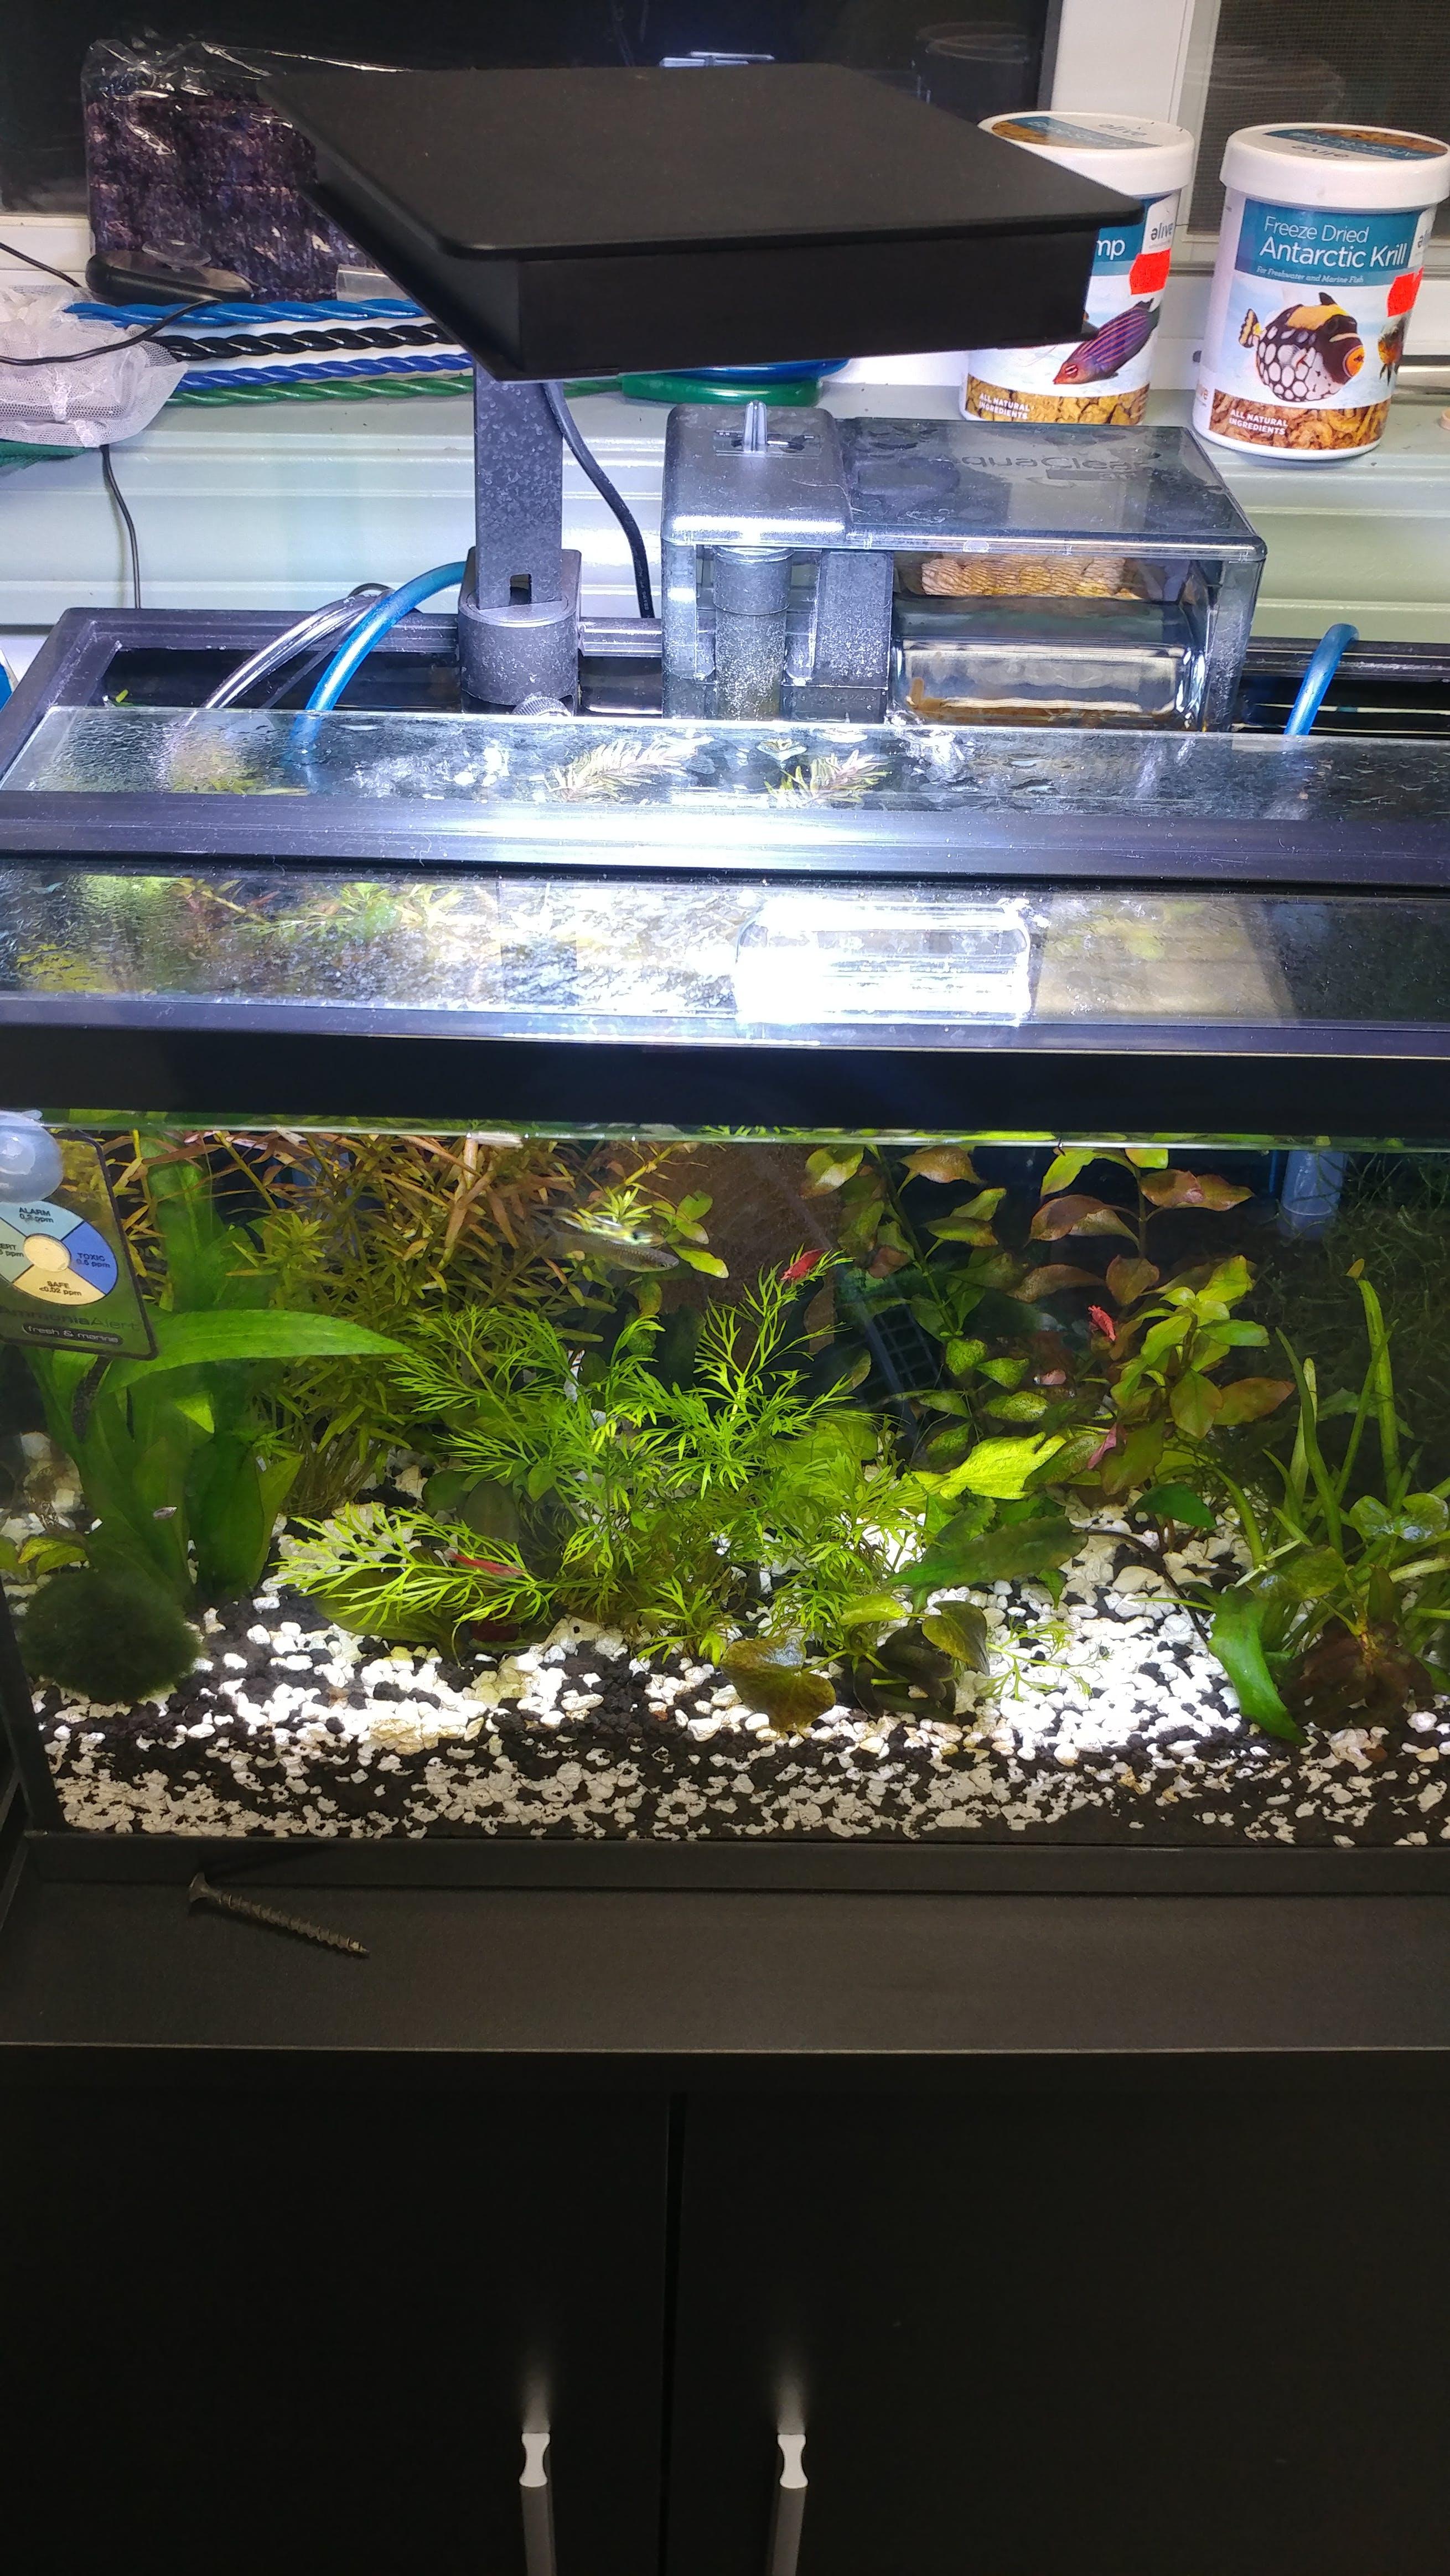 kits to aqueon tips aquarium light rectangle products starter success succeed led lights